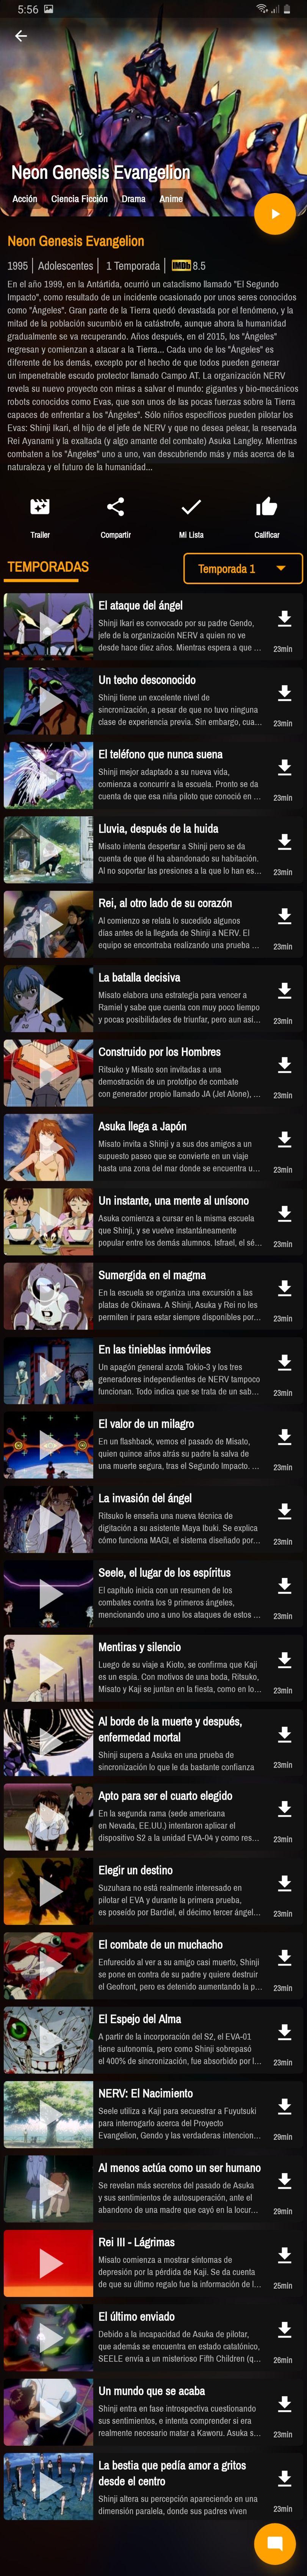 Neon Genesis Evangelion Temporada 1 Neon Genesis Evangelion Temporadas Ver Películas